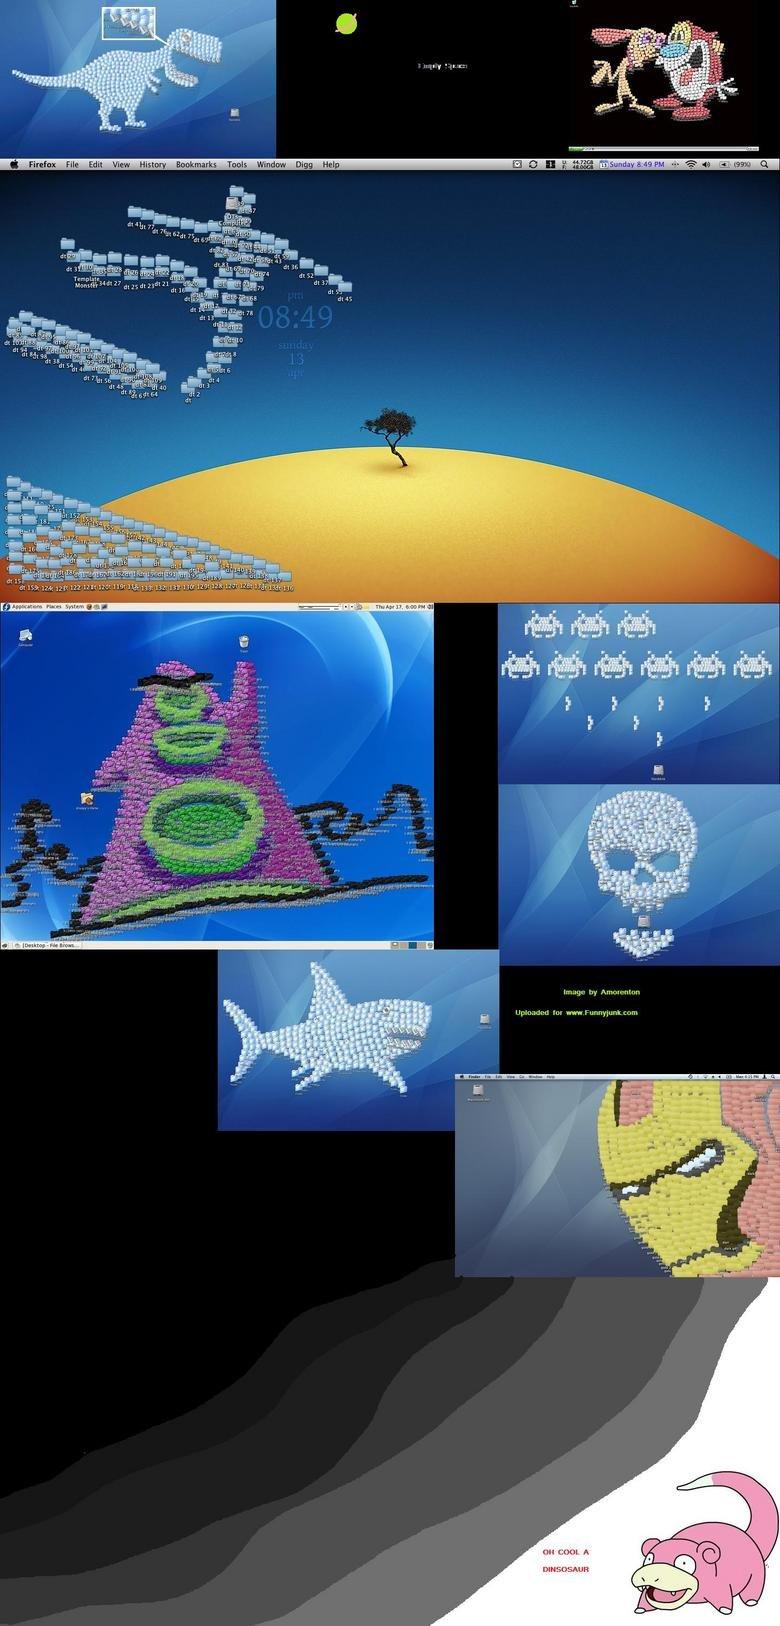 Icon Art. Cool desktop art done with icons.. aw History Bookmarks Tools mam V tit ISR my 122 um um um 1 gmw. mg. System 363 Hmcmu womo; Image try Amoranlan Uplo icons desktop Art